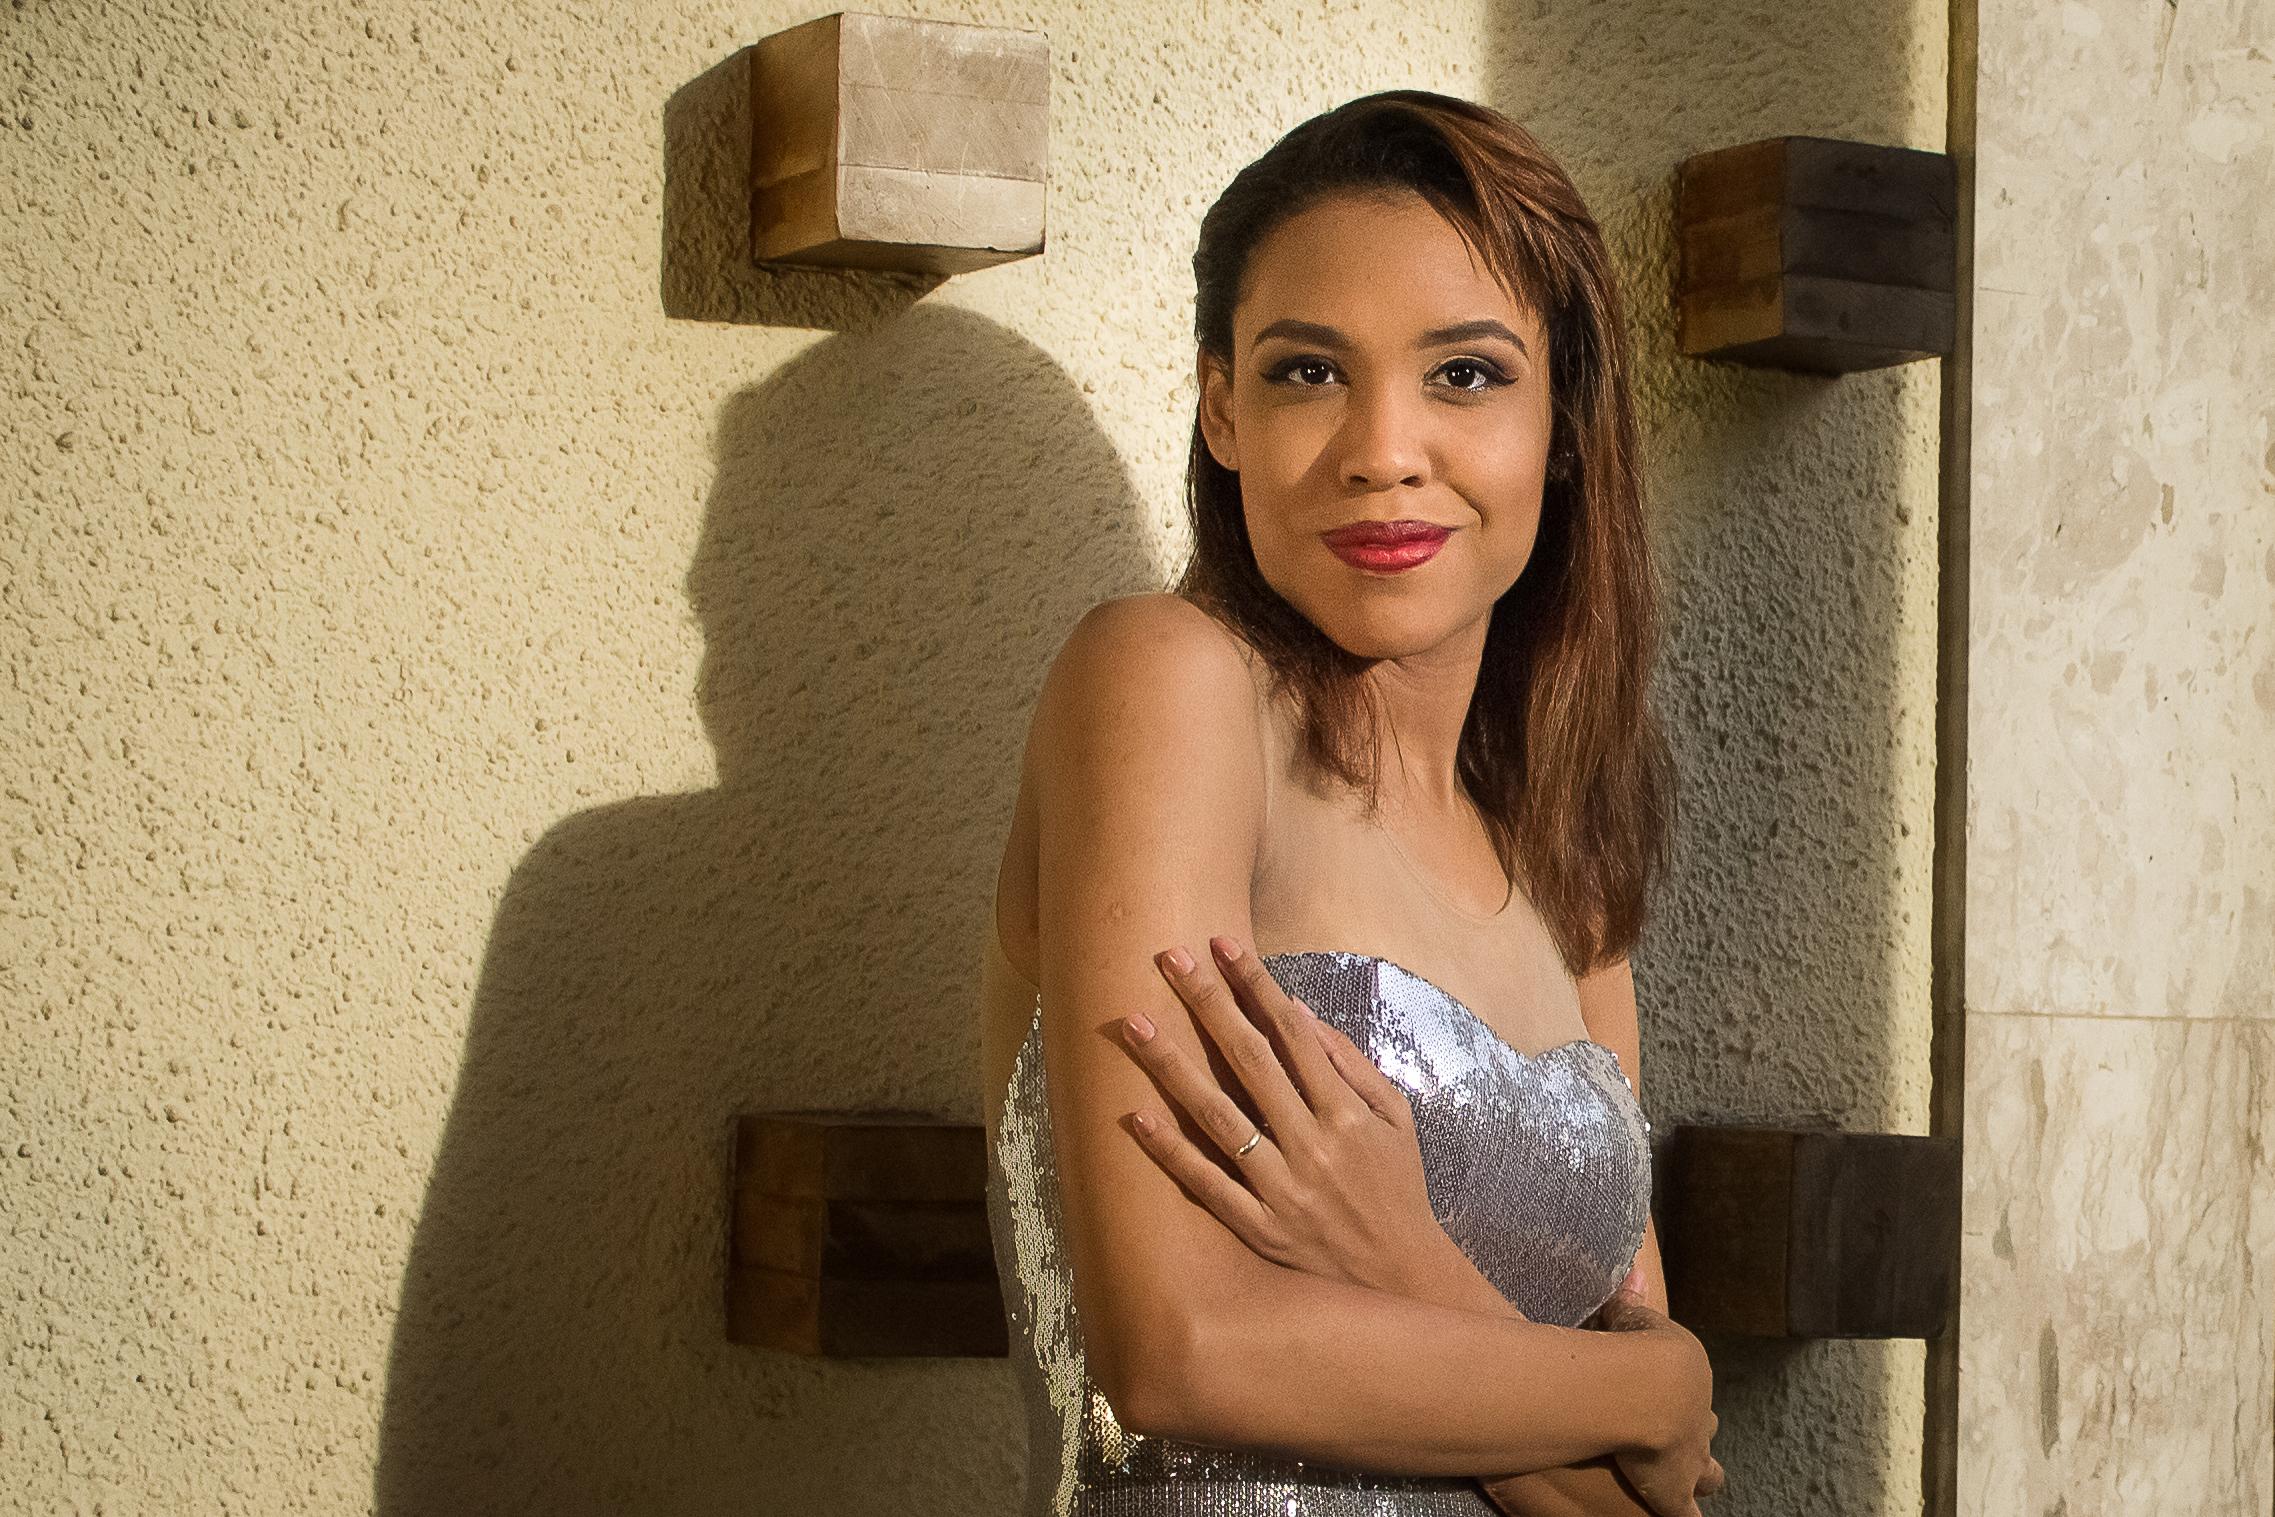 anatasha meckenna singer